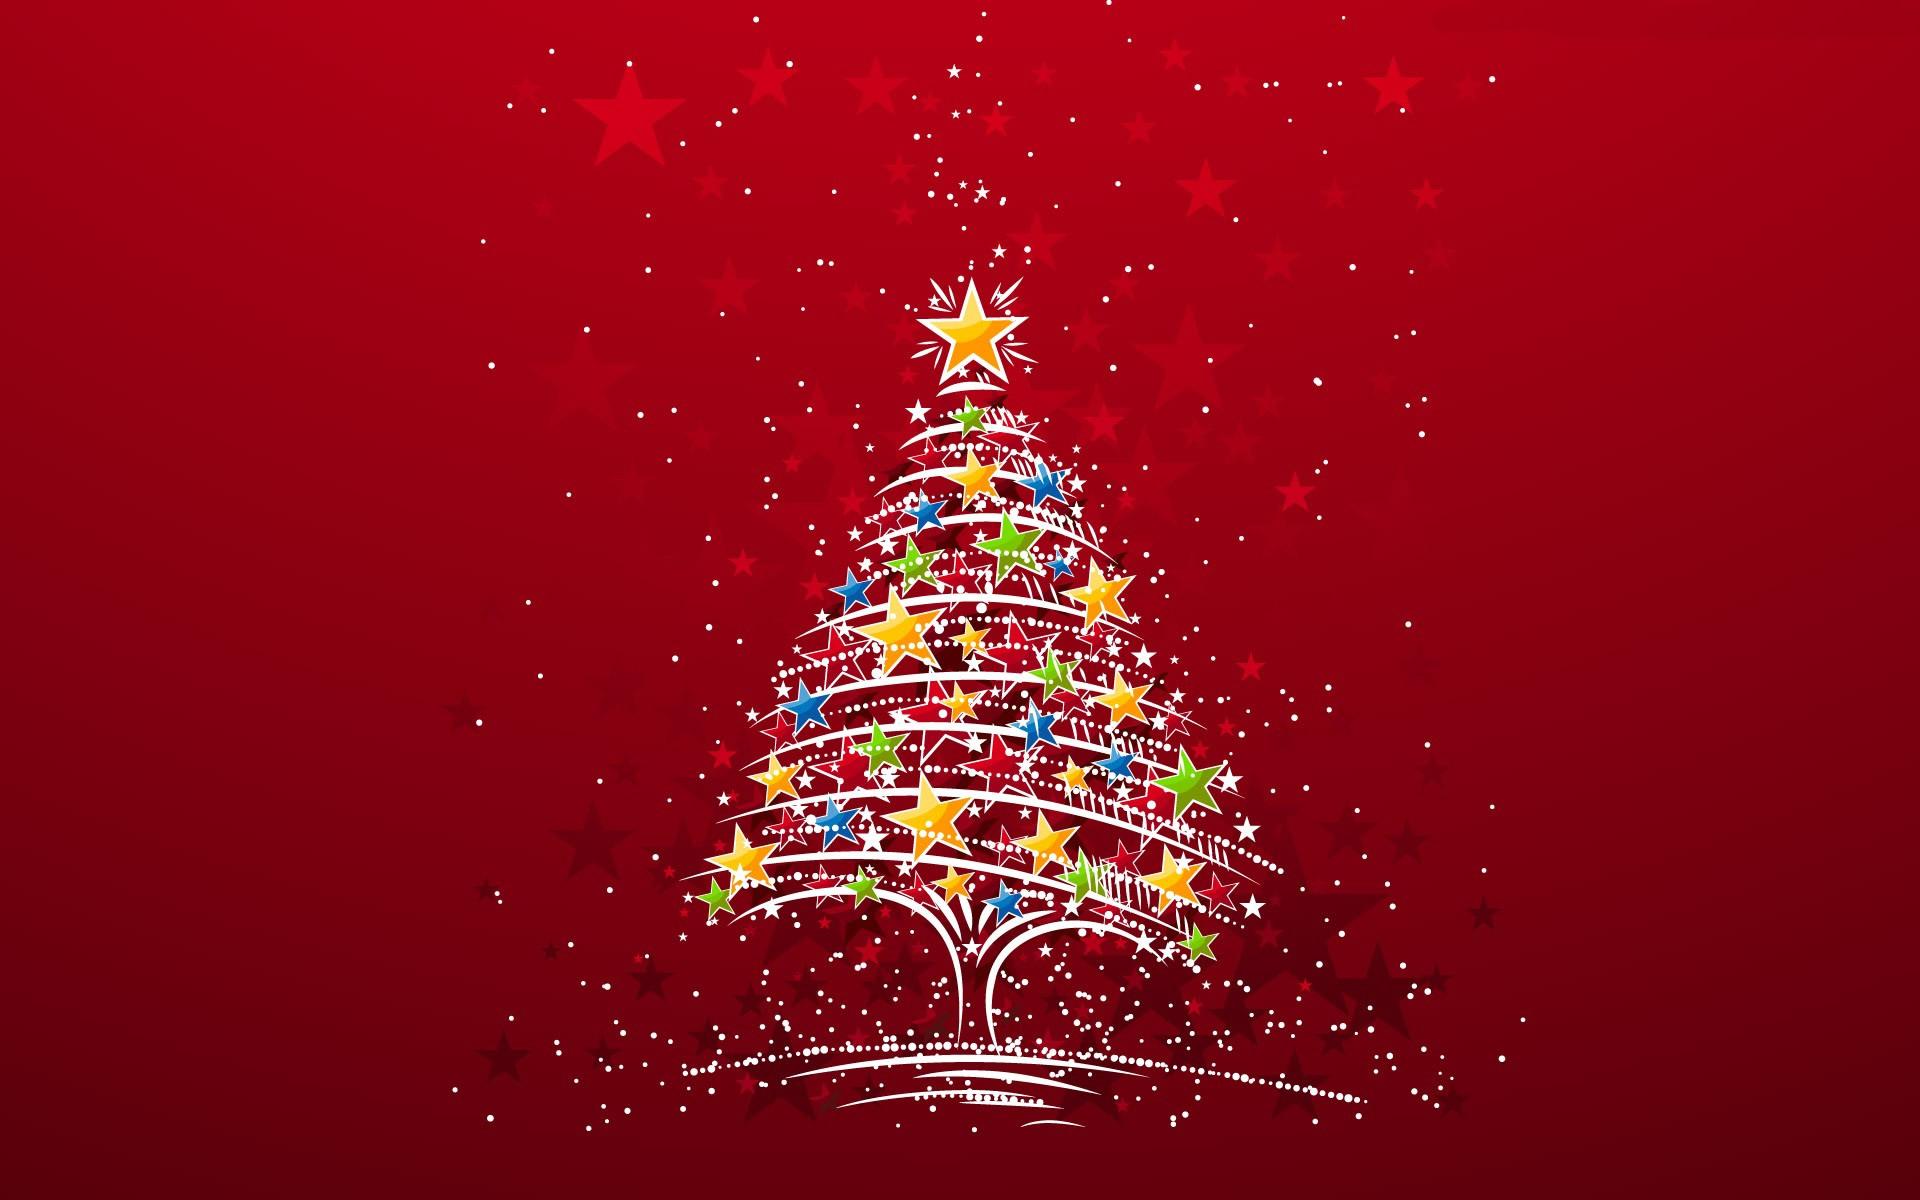 Good Wallpaper Music Christmas - christmas-wallpaper-hd-8463-8796-hd-wallpapers  Graphic_87089.jpg